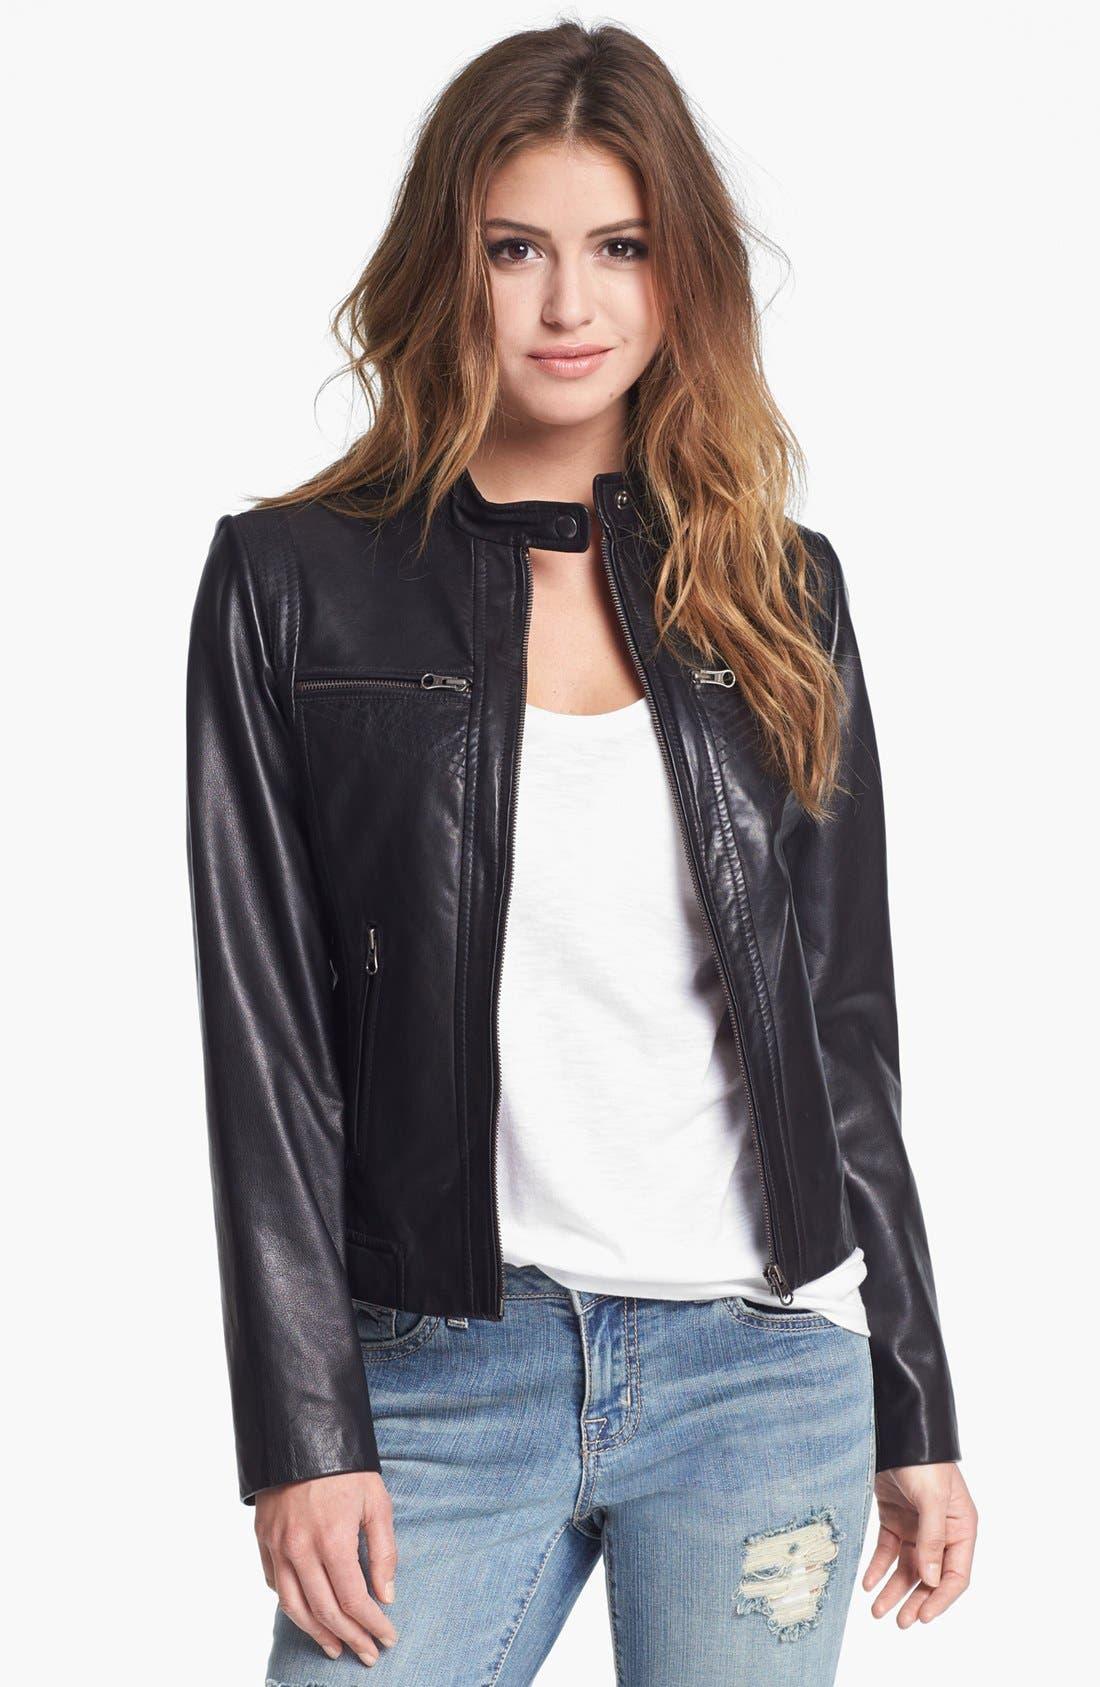 Main Image - Bernardo Tab Collar Leather Jacket (Regular & Petite) (Nordstrom Exclusive)